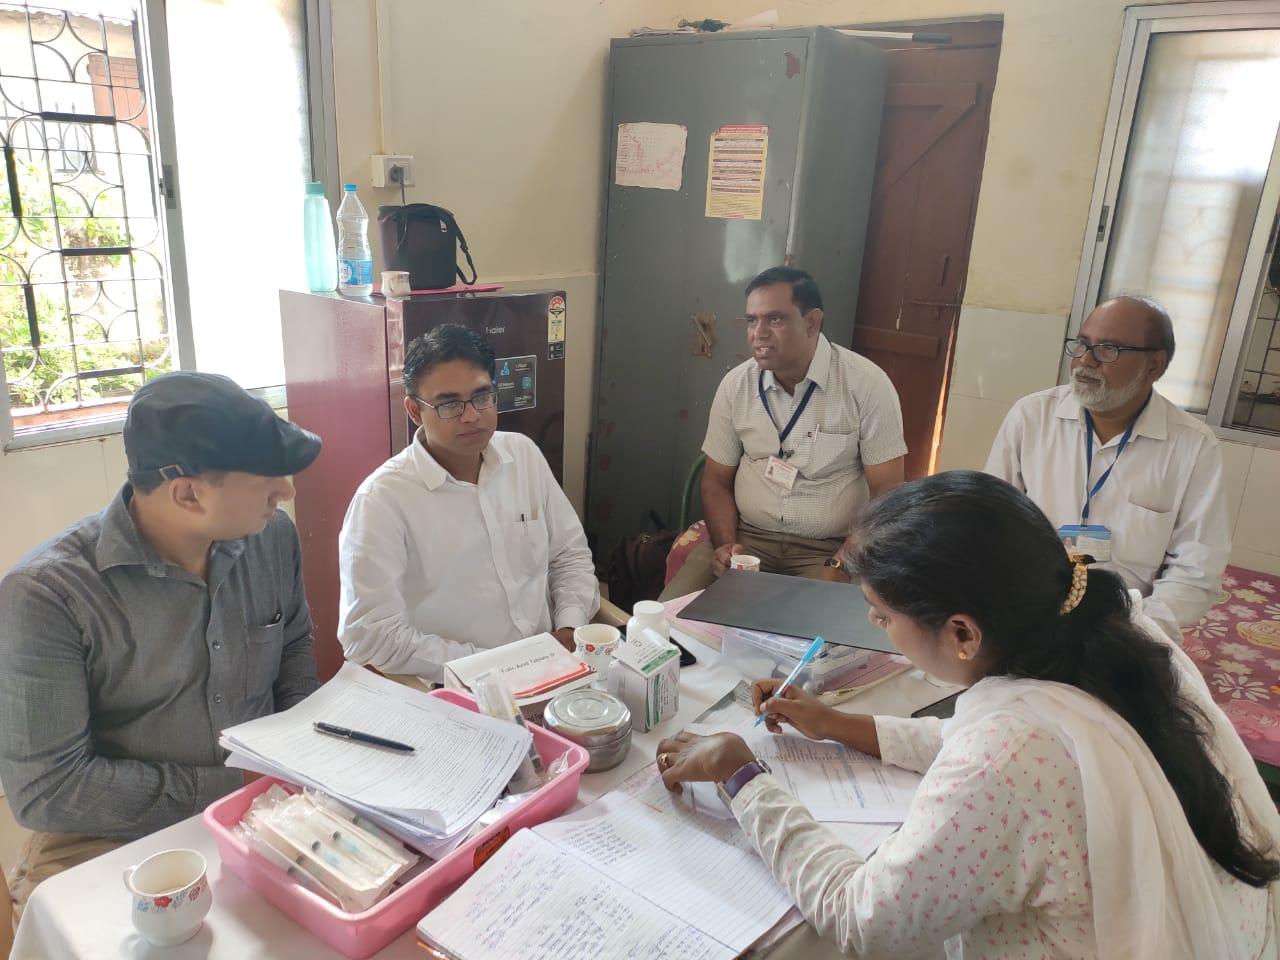 Session observation for baseline assessment at Nagpur, Maharashtra